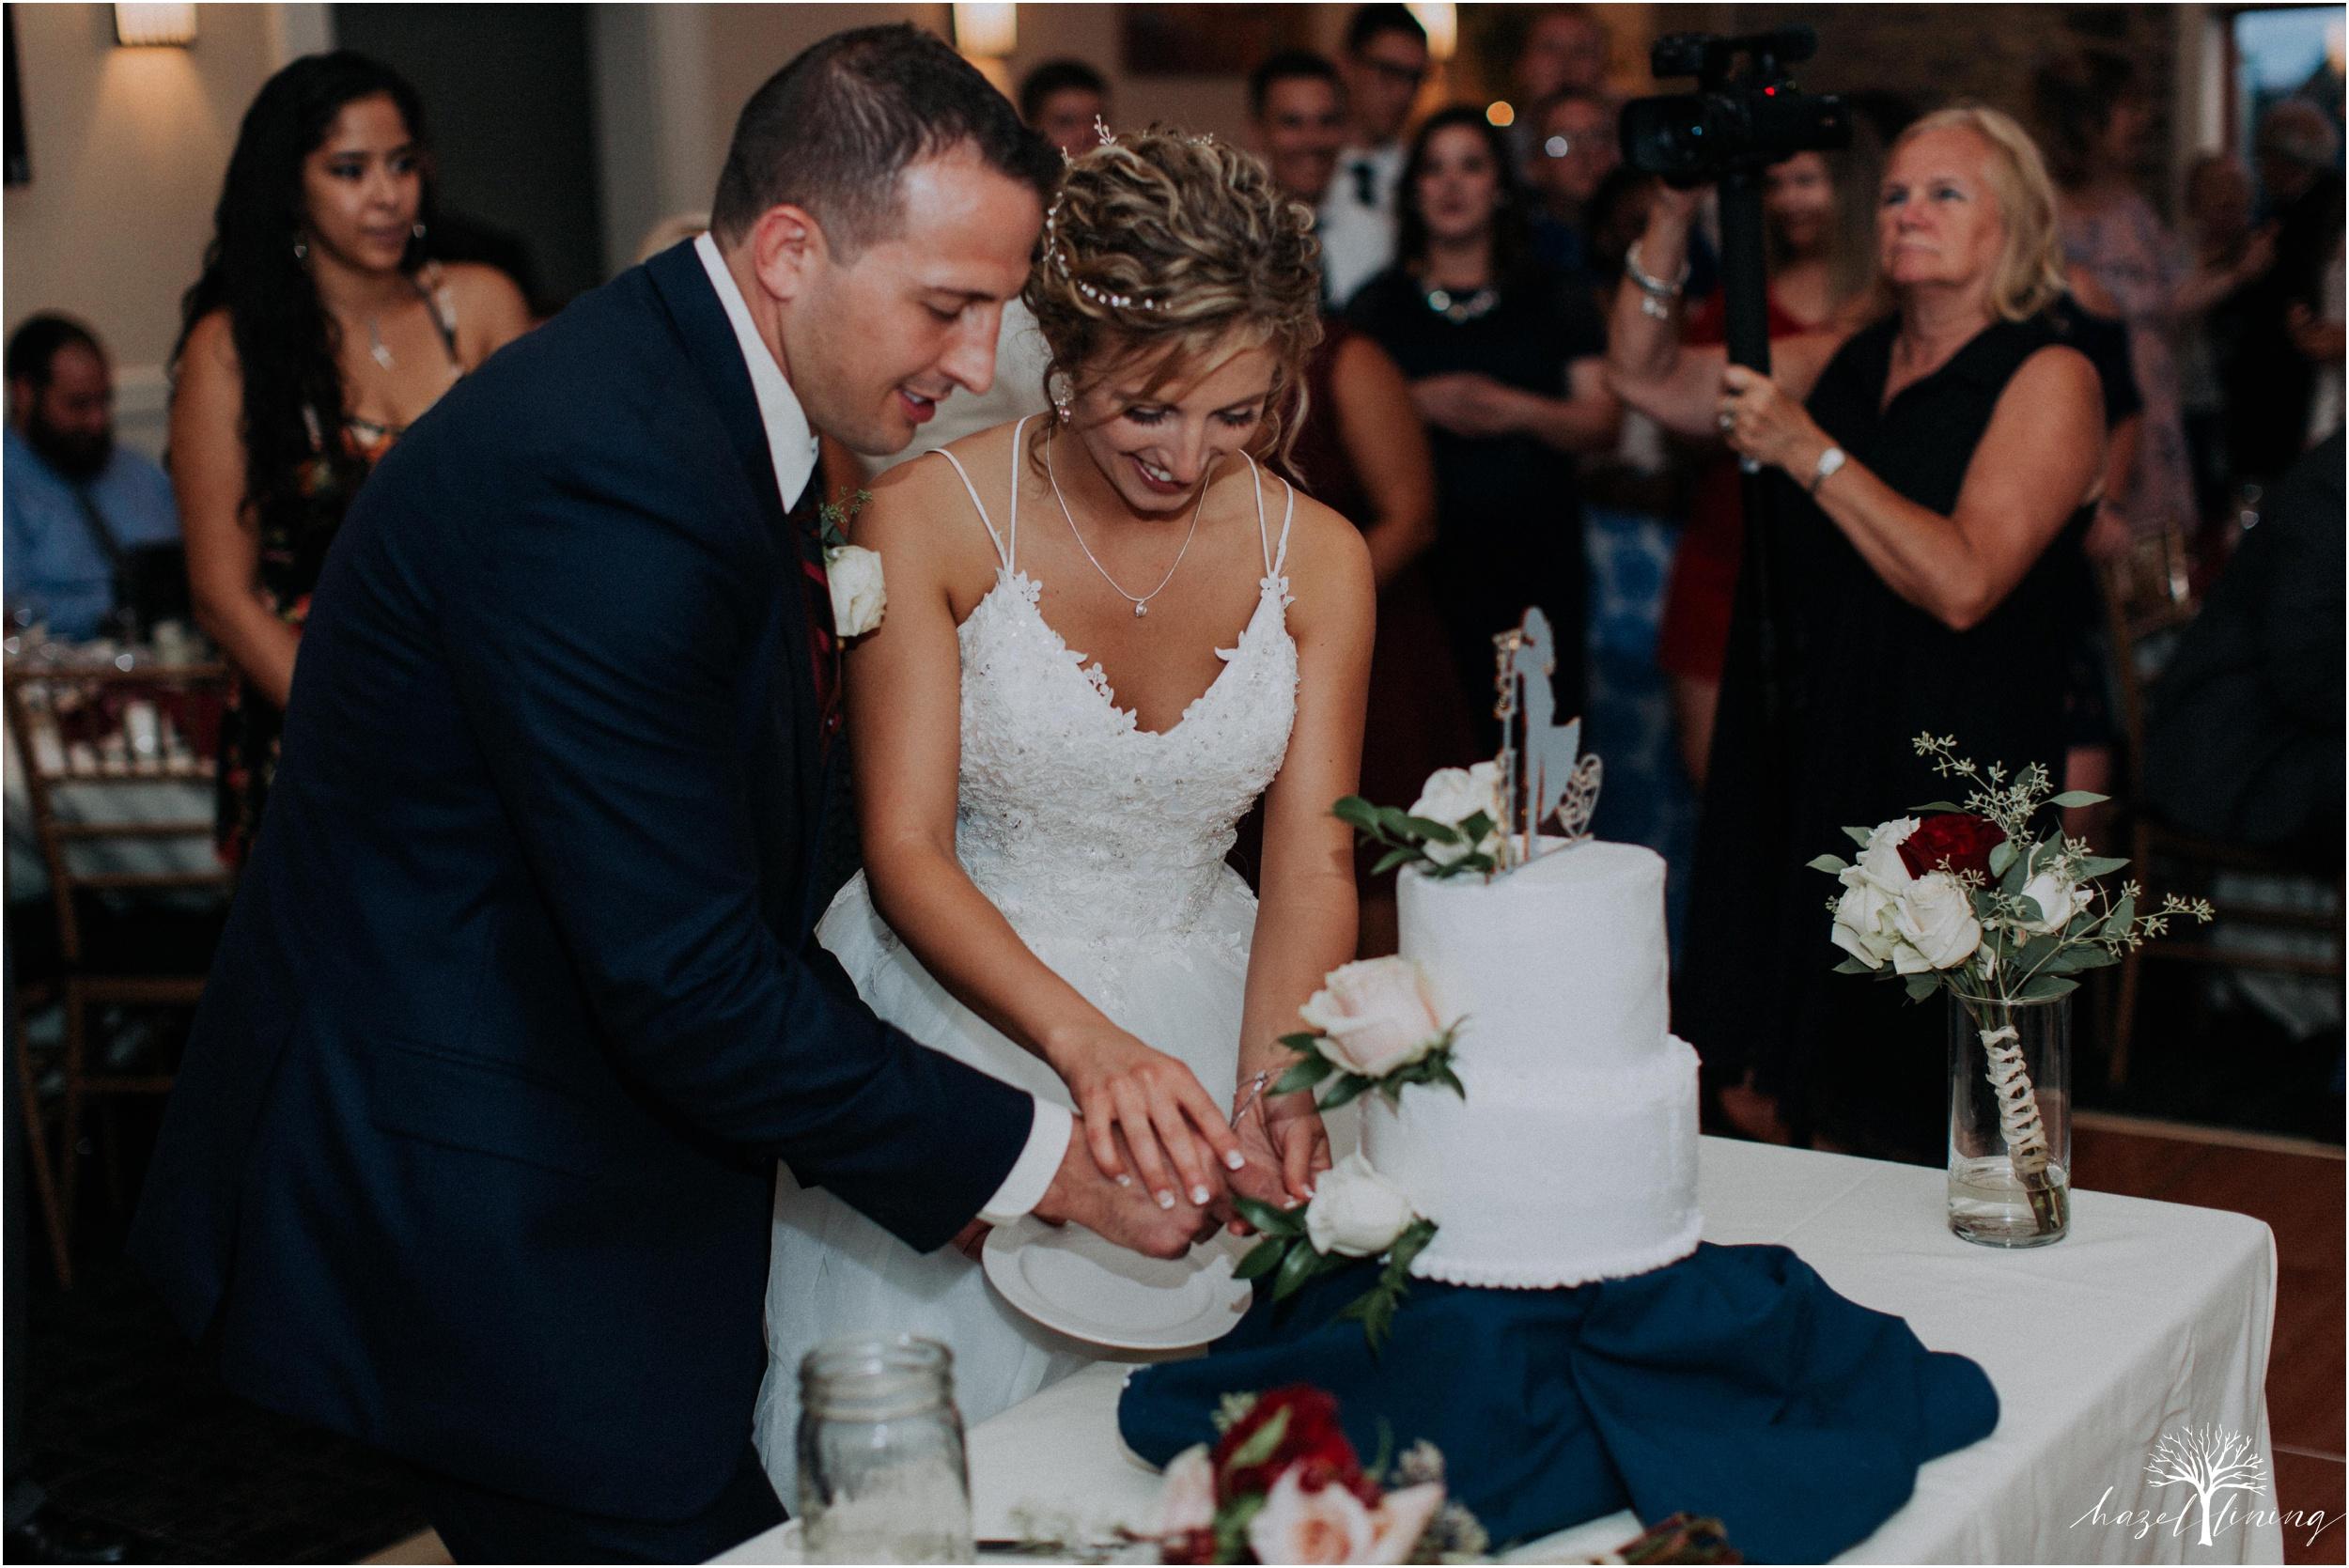 jonathan-weibel-becky-haywood-loft-at-sweetwater-cc-pennsburg-pennsylvania-rainy-day-summer-wedding-hazel-lining-travel-wedding-elopement-photography_0127.jpg